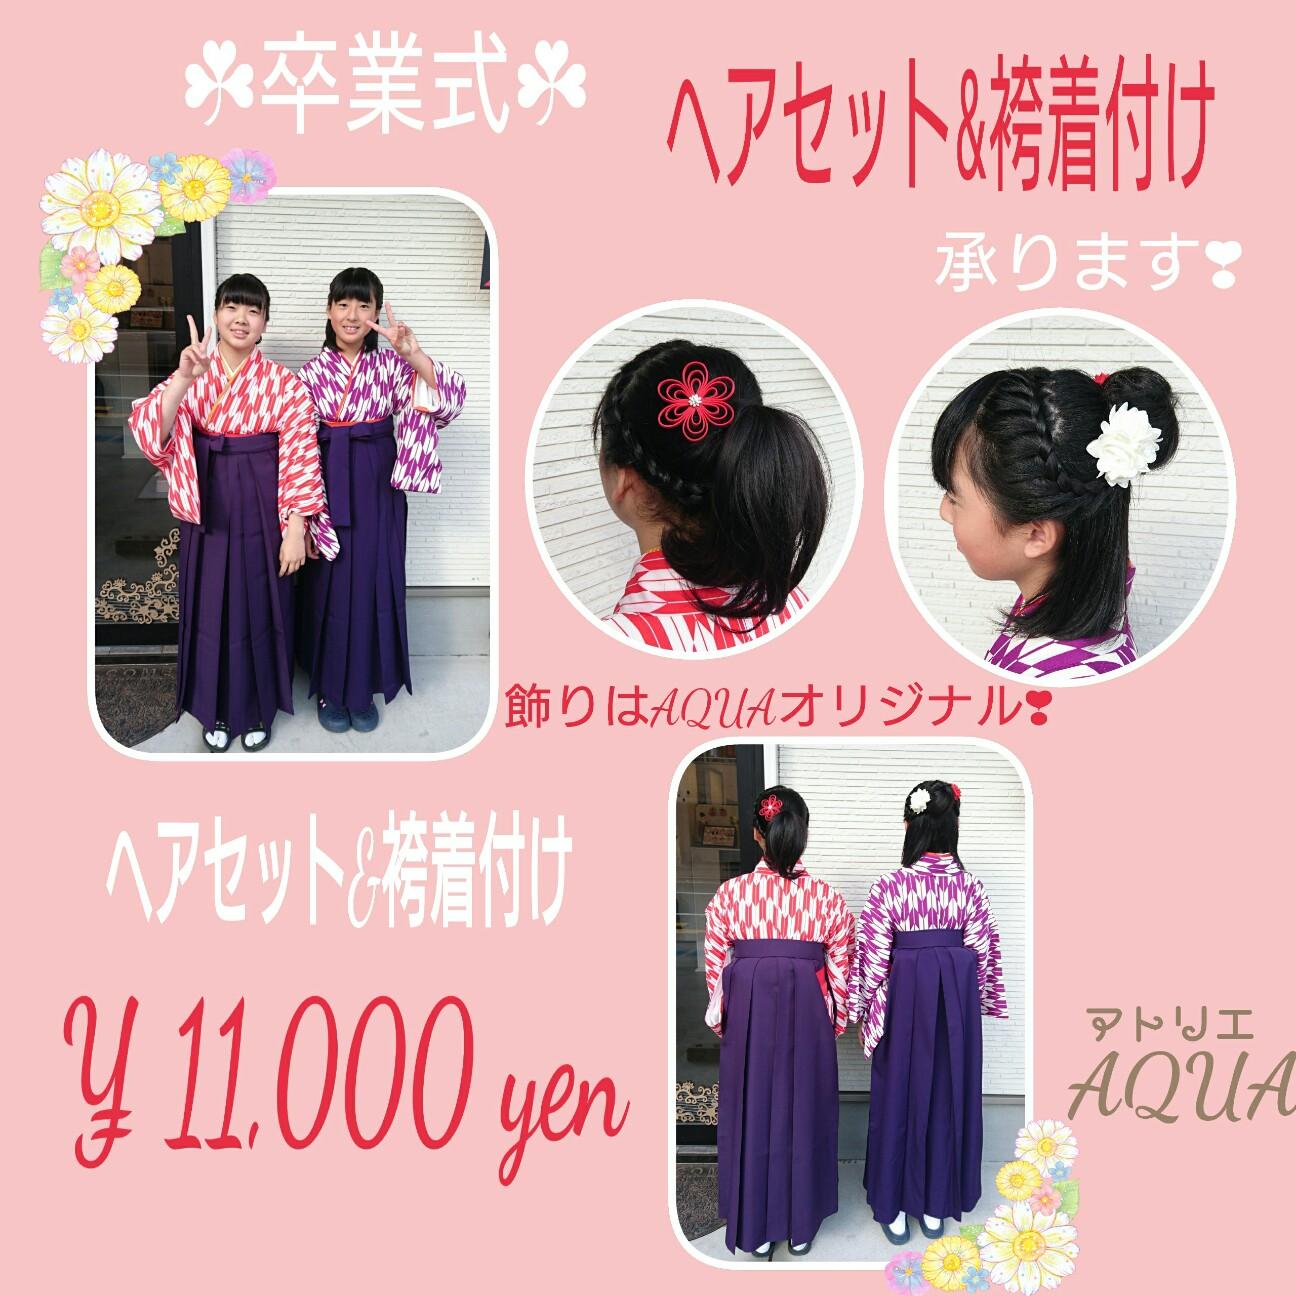 f:id:aquayukino:20190316032357j:image